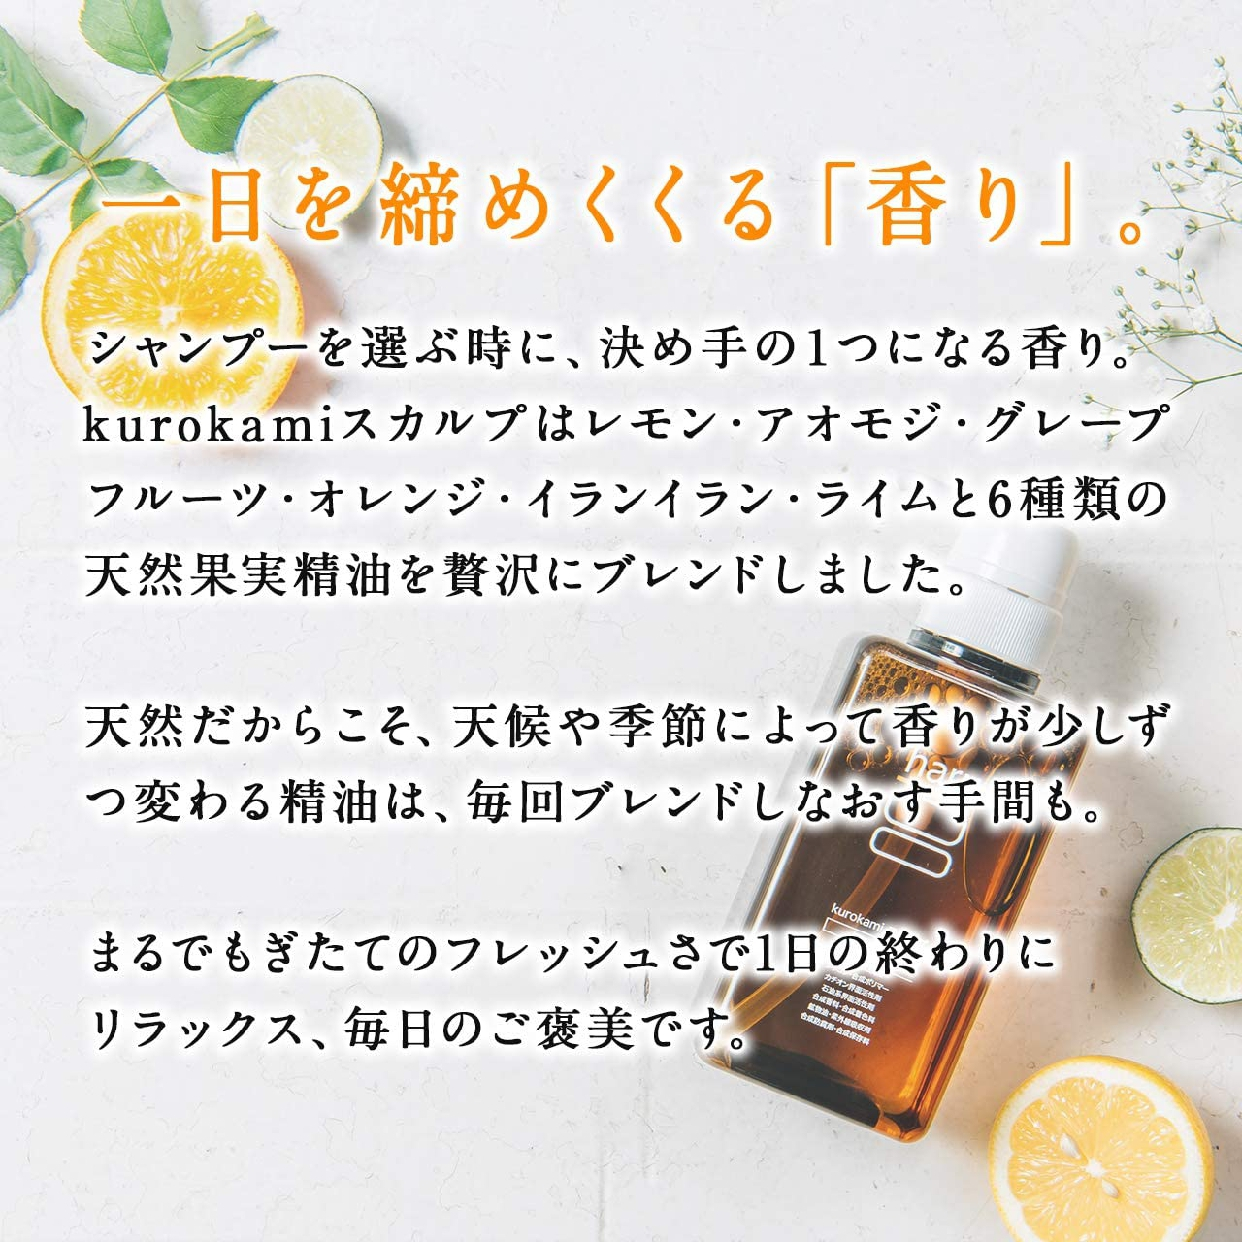 haru(ハル)kurokami スカルプの商品画像12